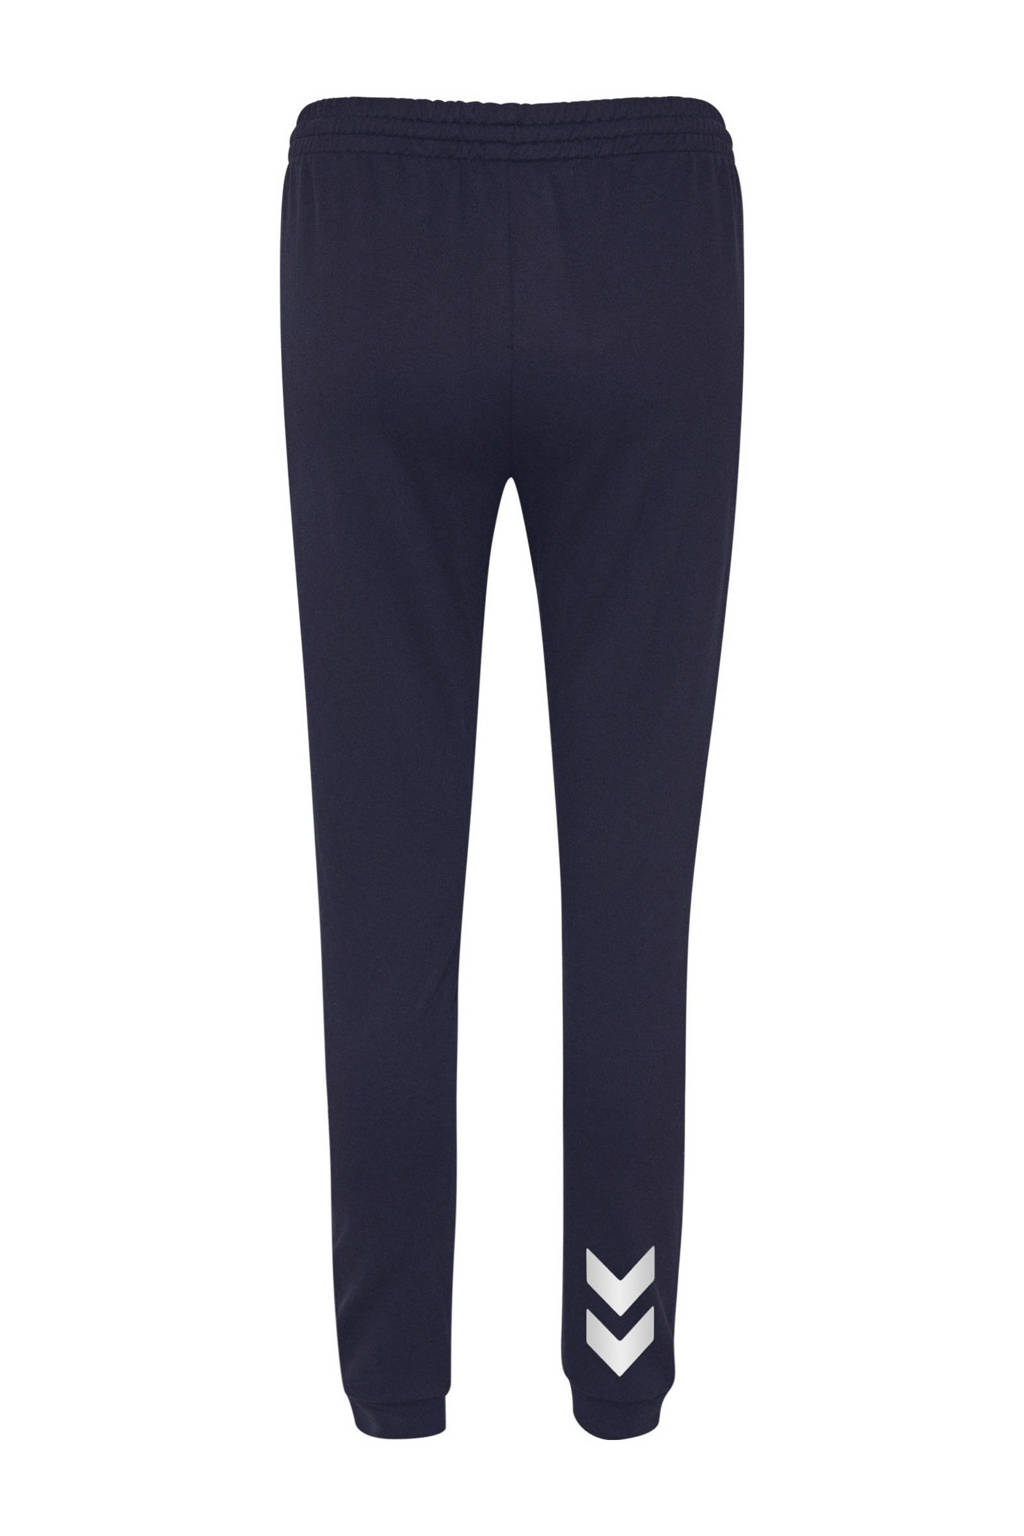 hummel joggingbroek donkerblauw, Donkerblauw